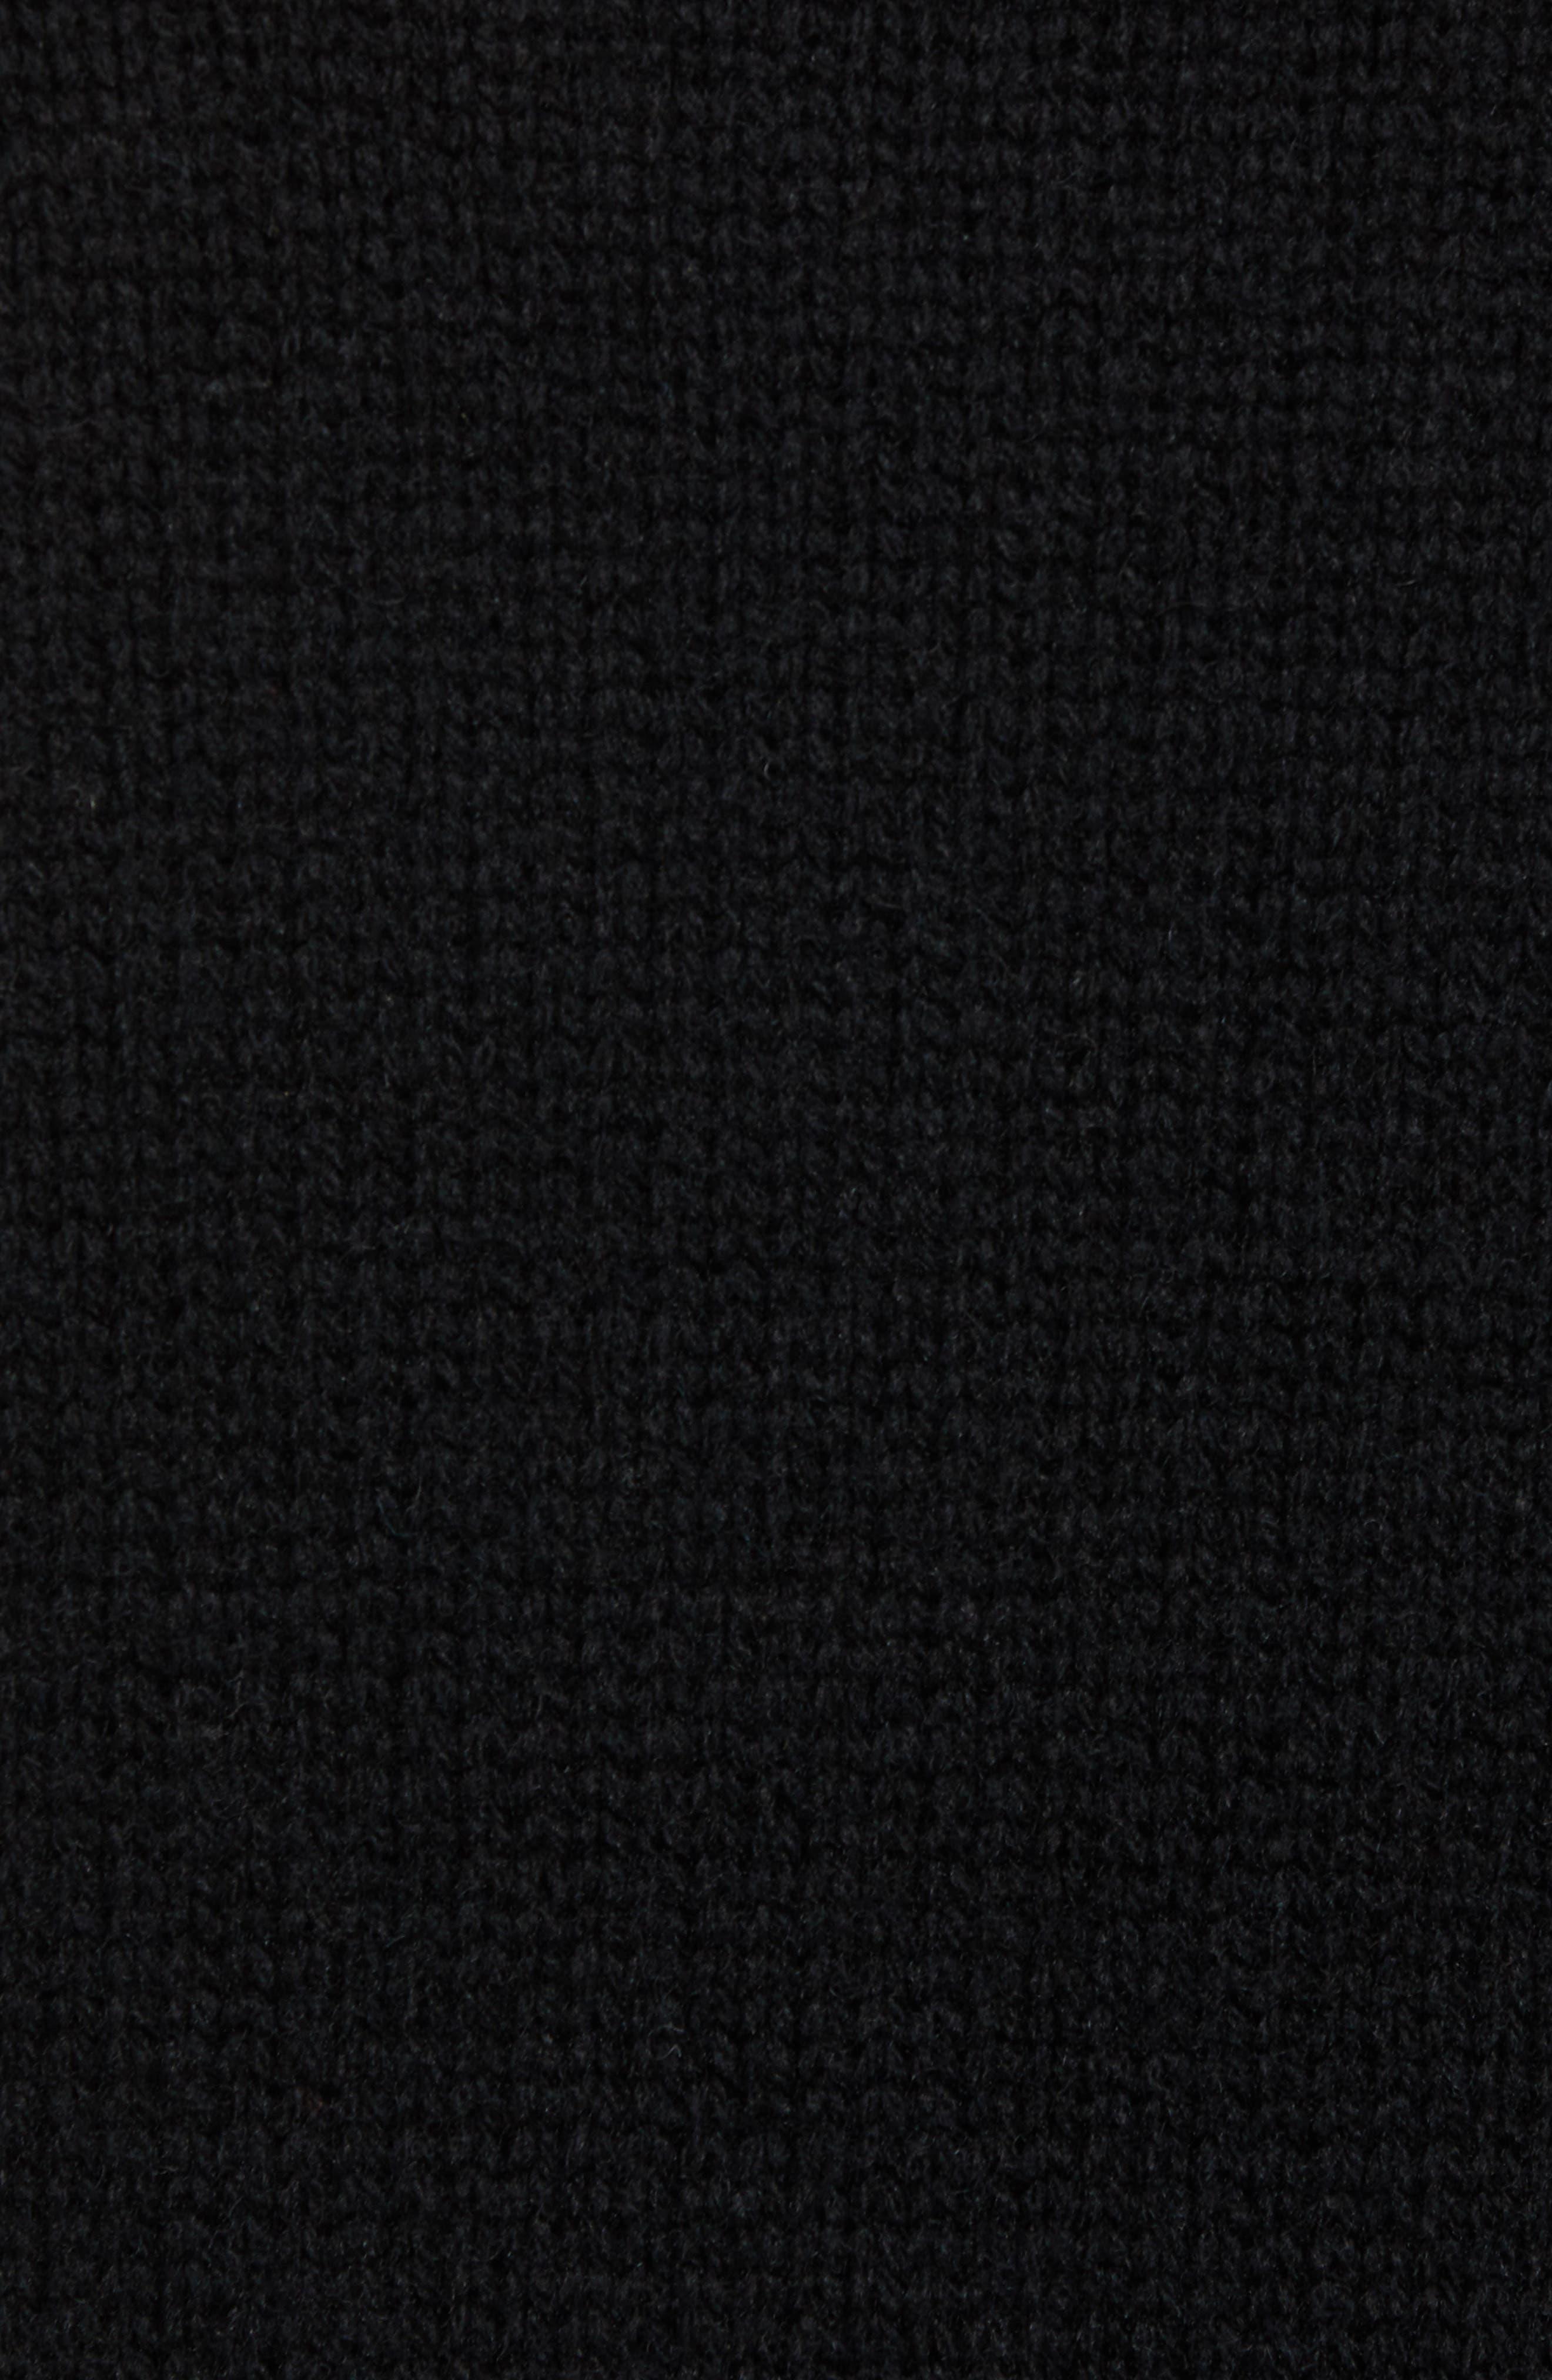 Star Wool Sweater,                             Alternate thumbnail 5, color,                             BLACK WHITECAP GREY